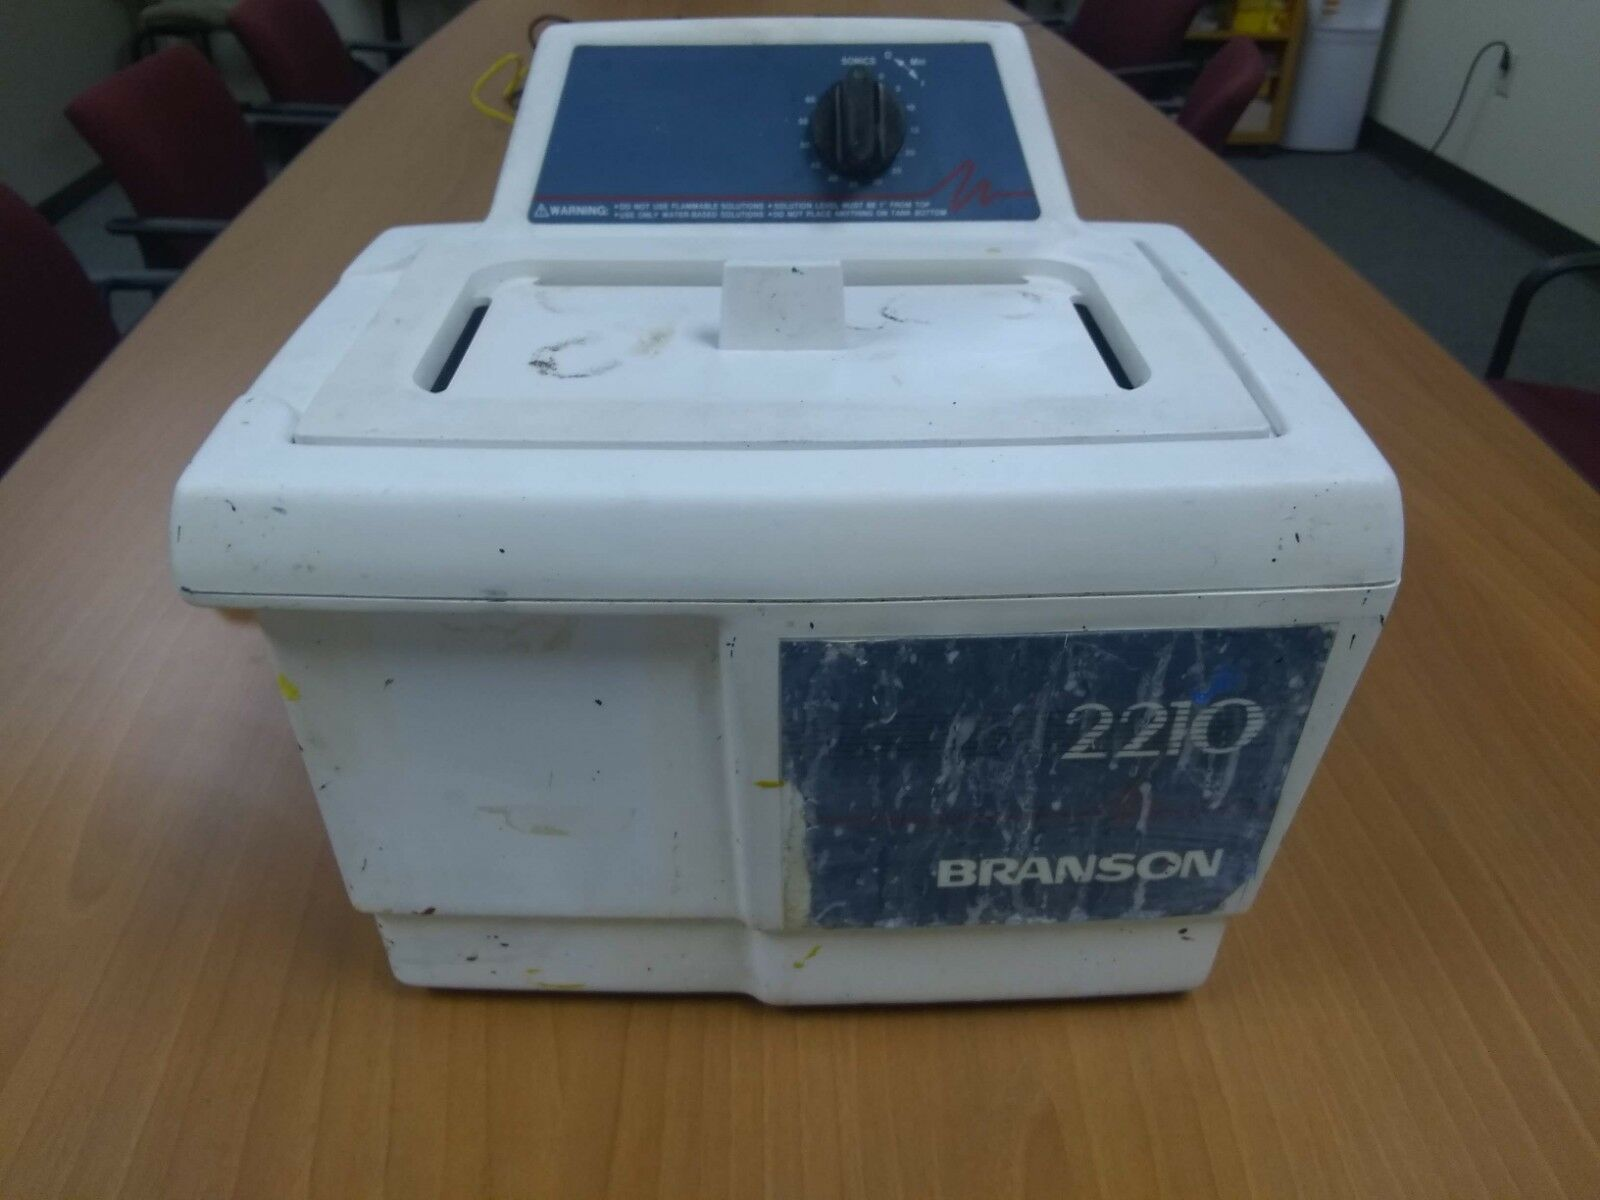 BRANSONIC ULTRASONIC CLEANER 2210R-MT SERIES 2210